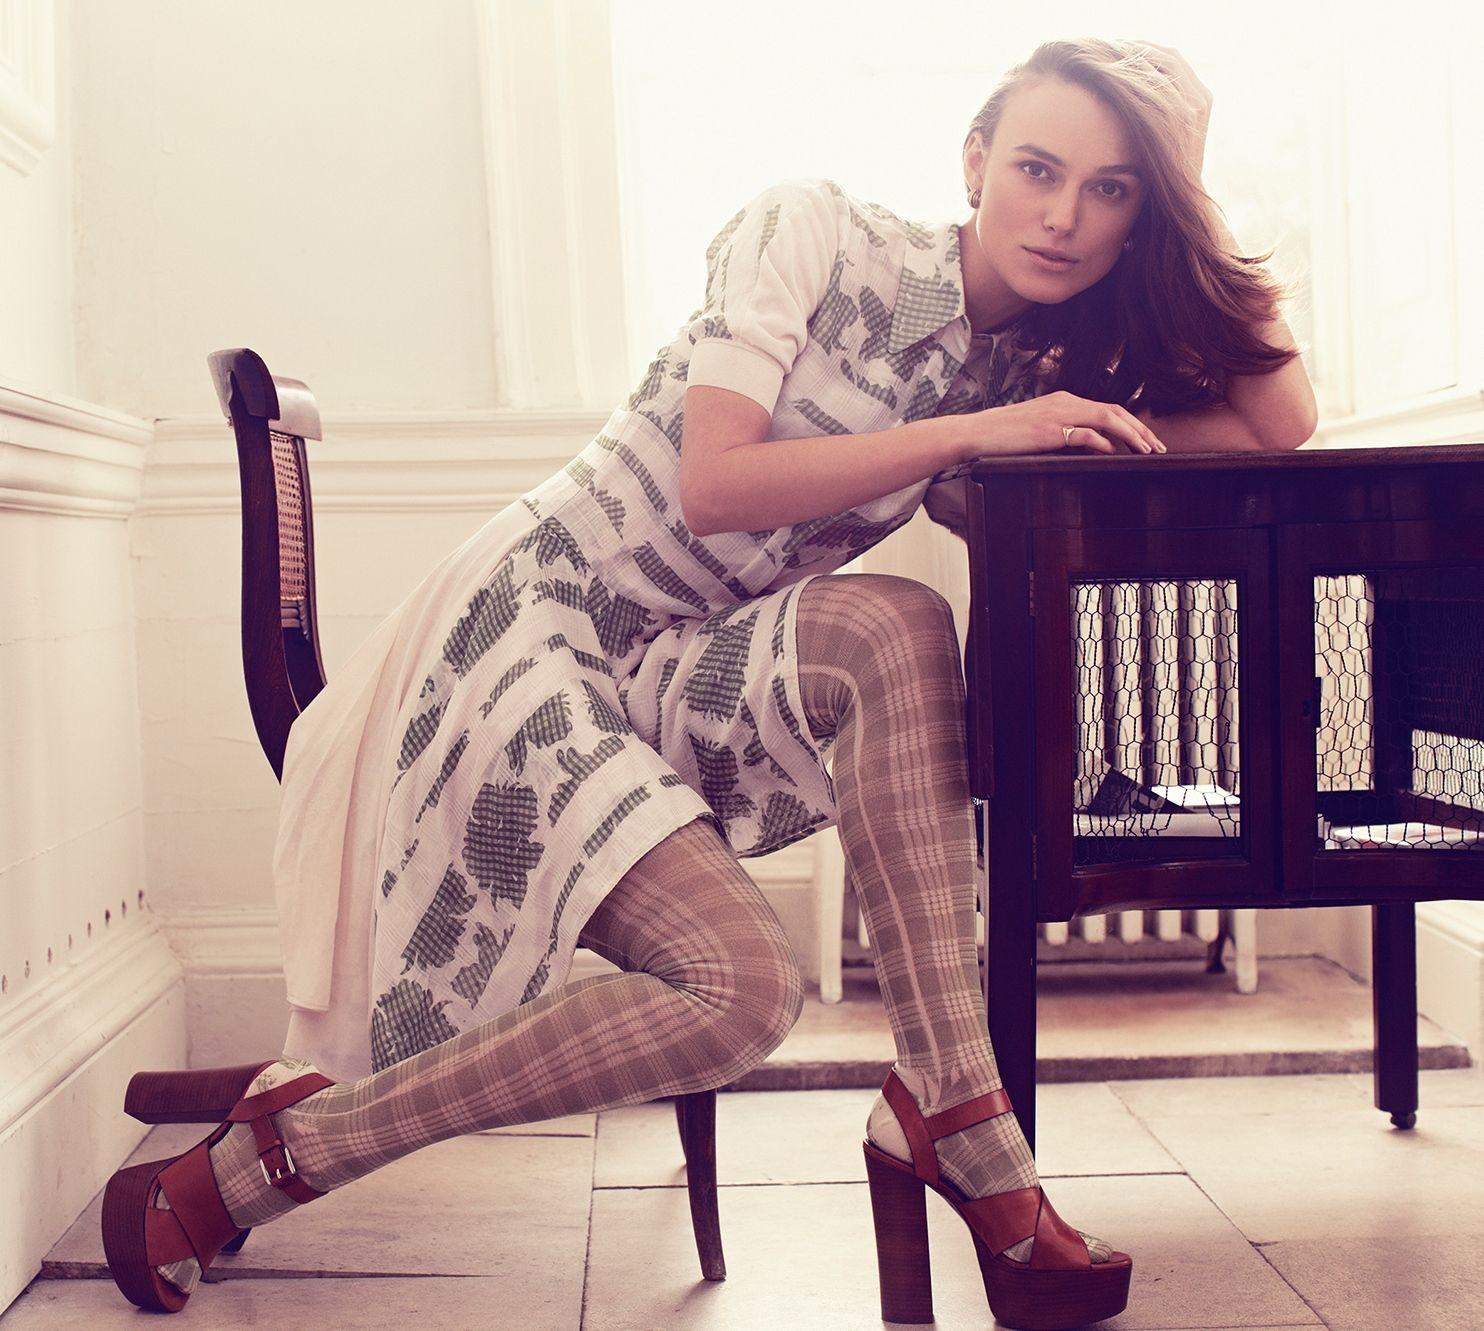 Keira Knightley, Women, Piano, See through Clothing